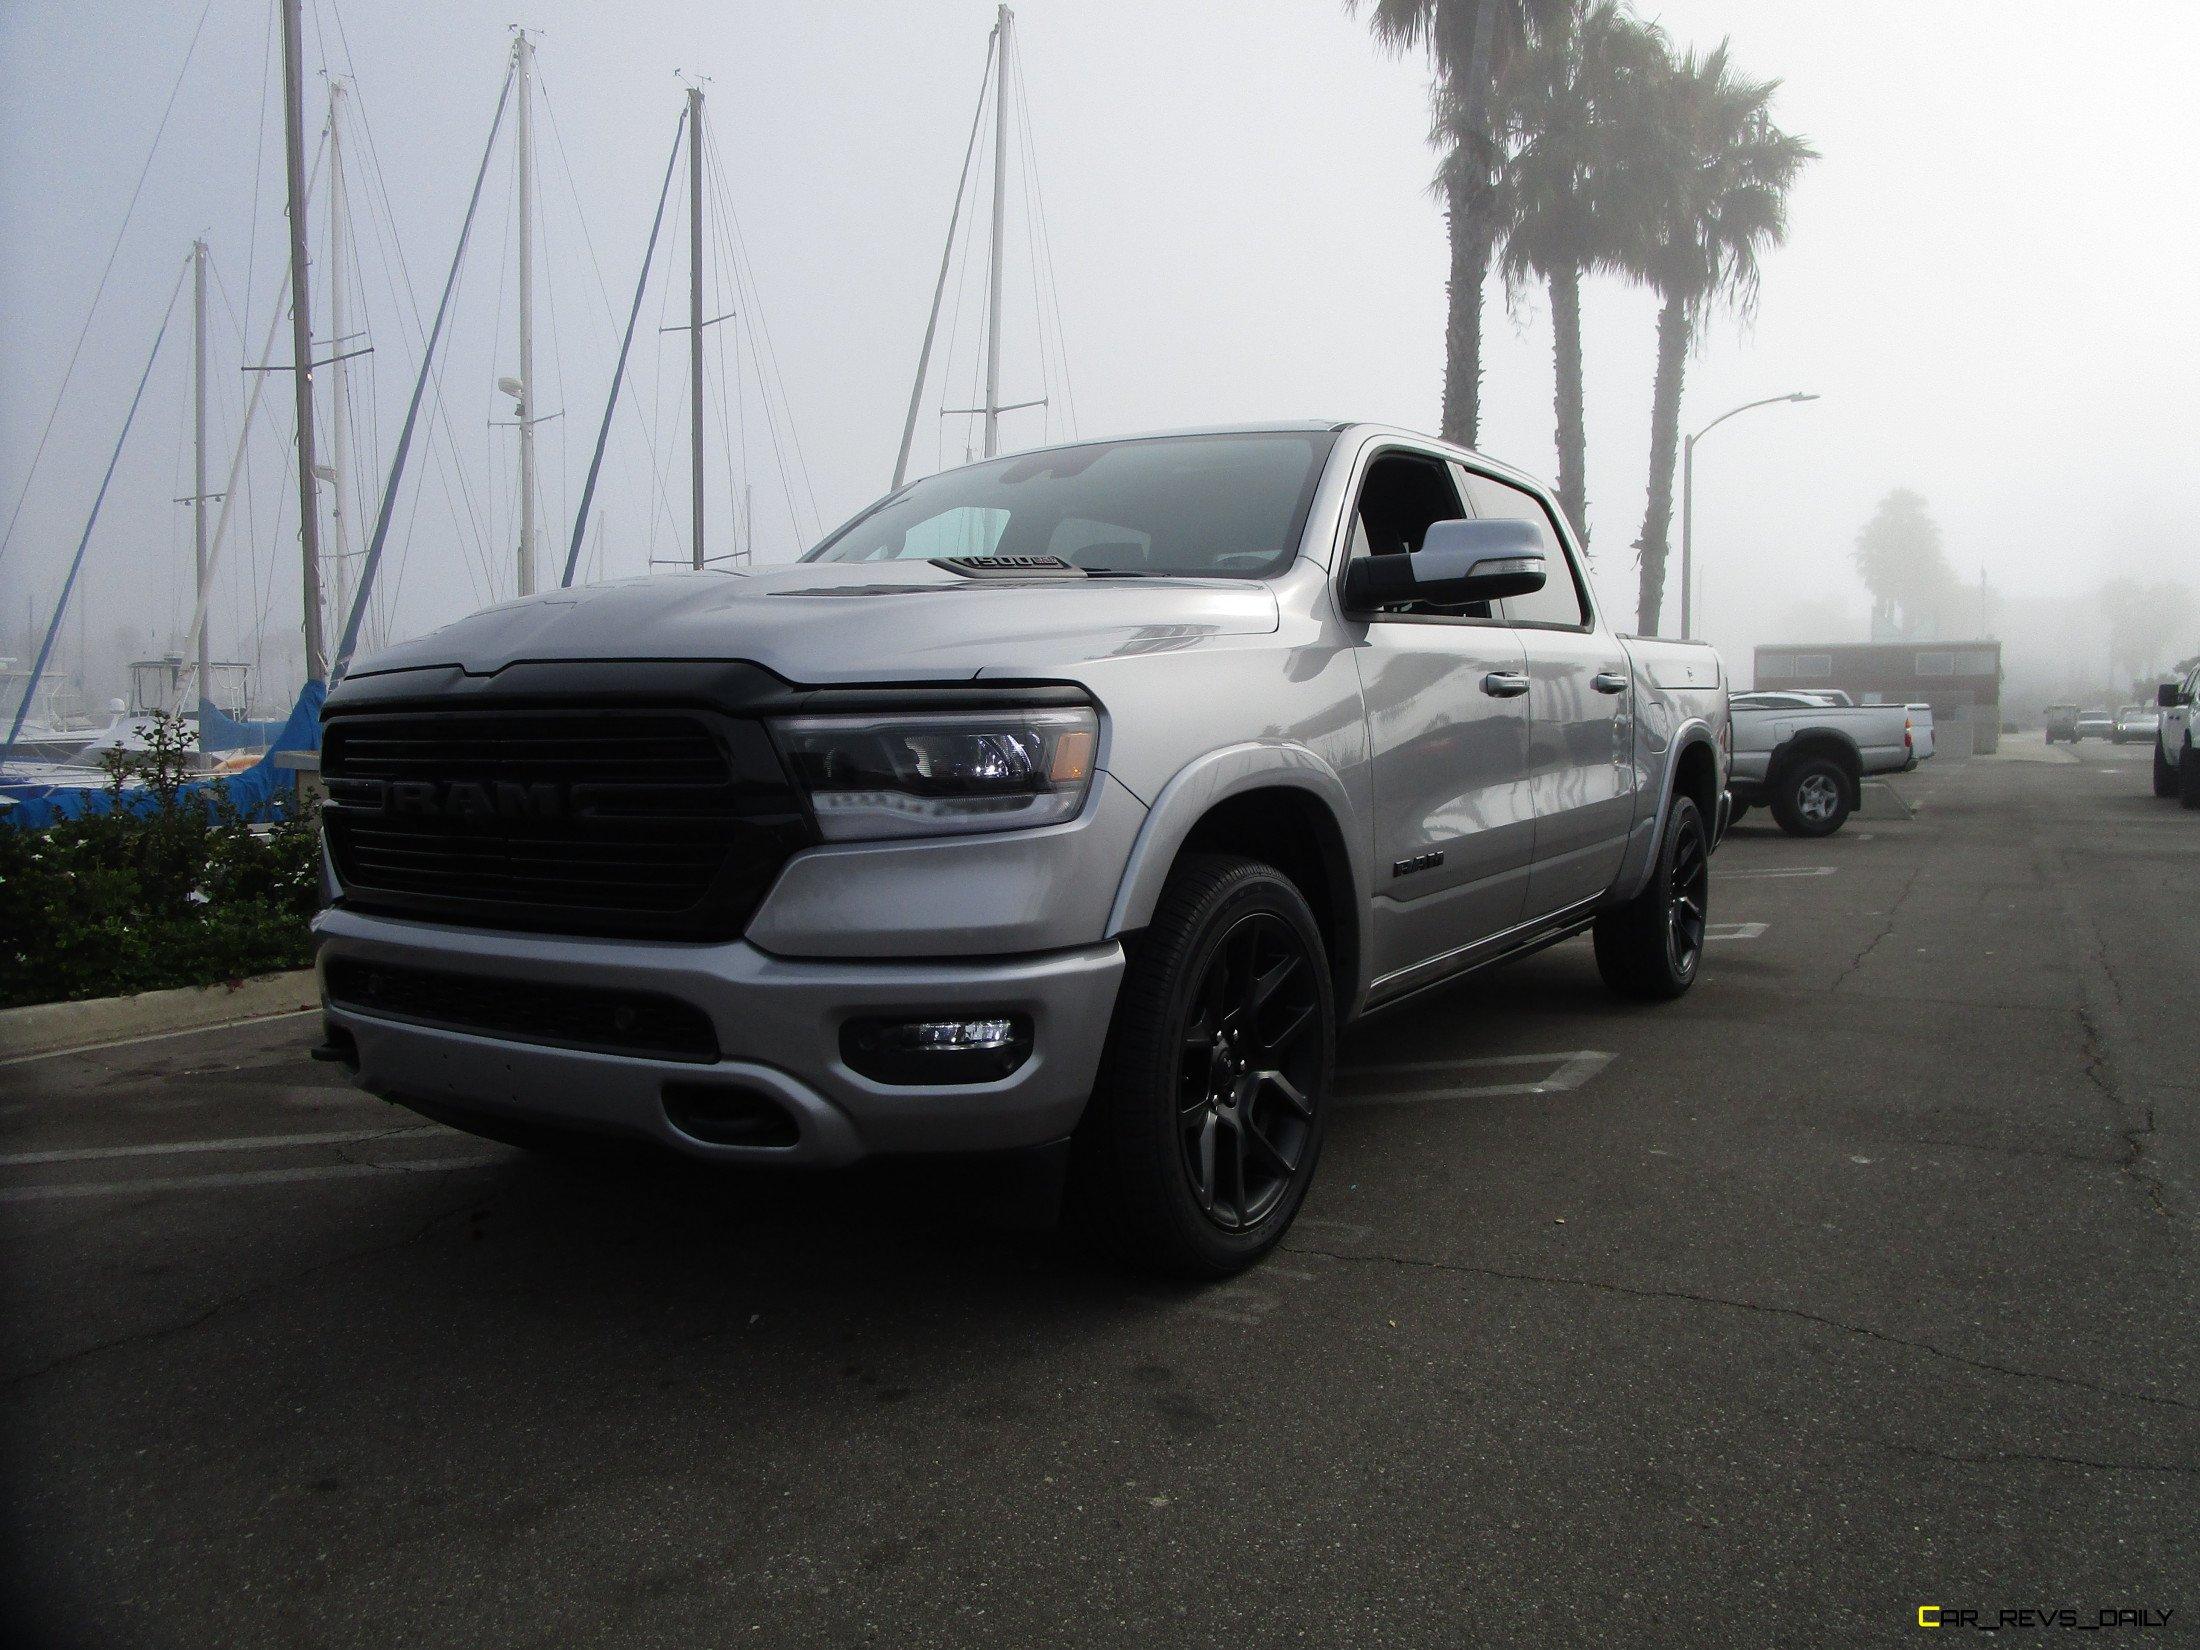 2020 Dodge Ram Topic Hub